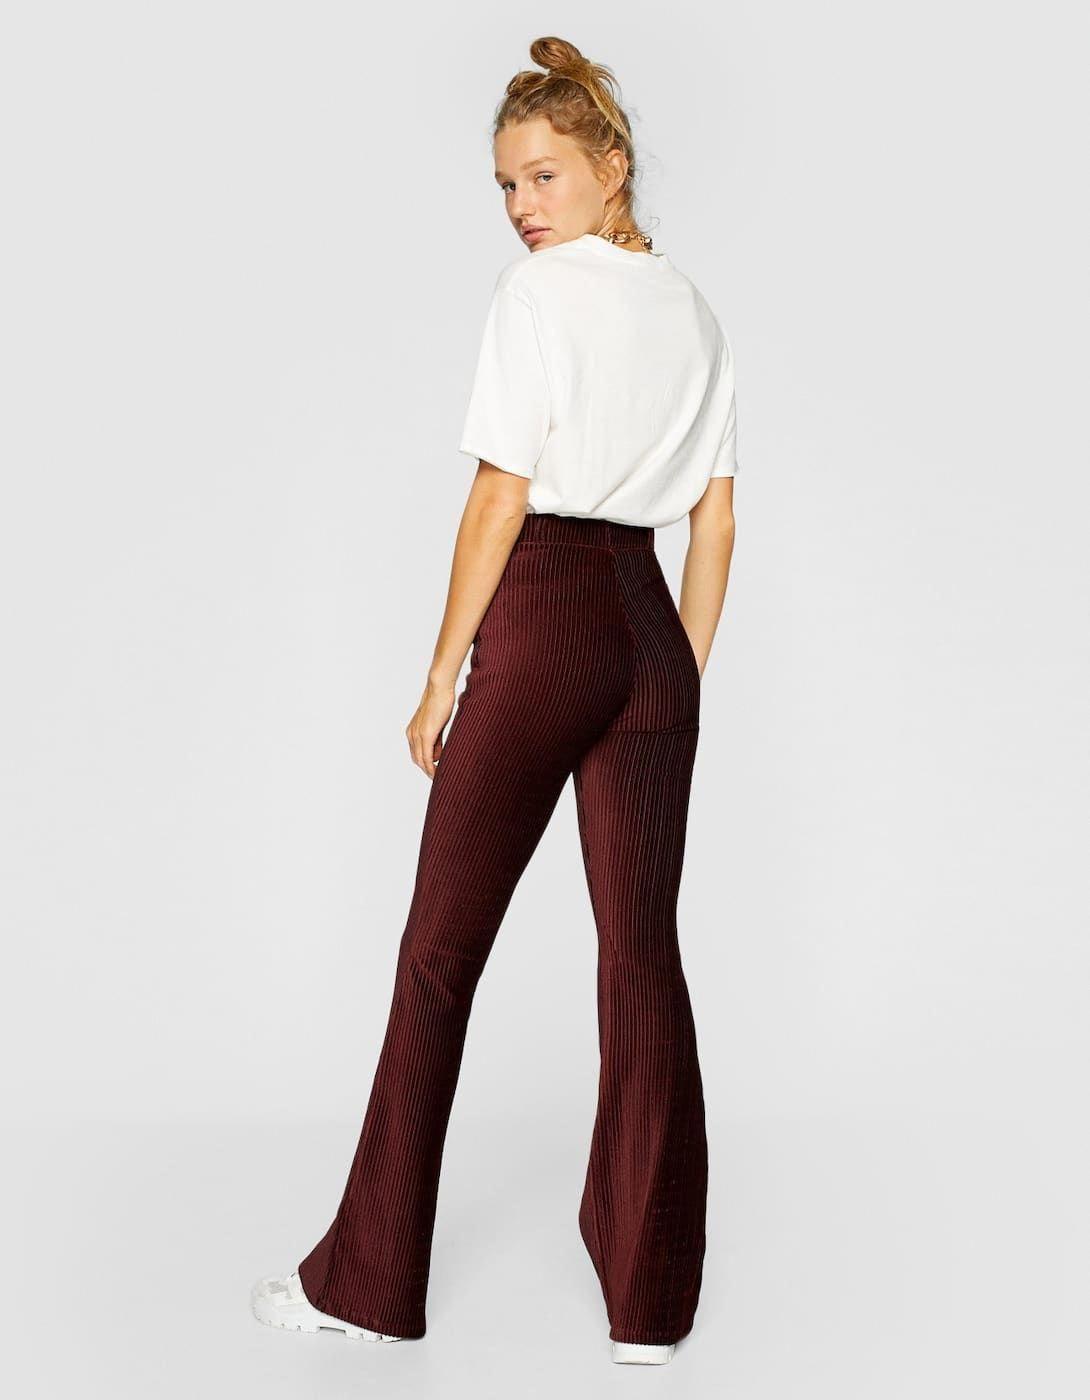 Pantalon Flare Velours Cotele Pantalons Stradivarius France Modefrancestyle Fashion Trendy Outfits Outfits